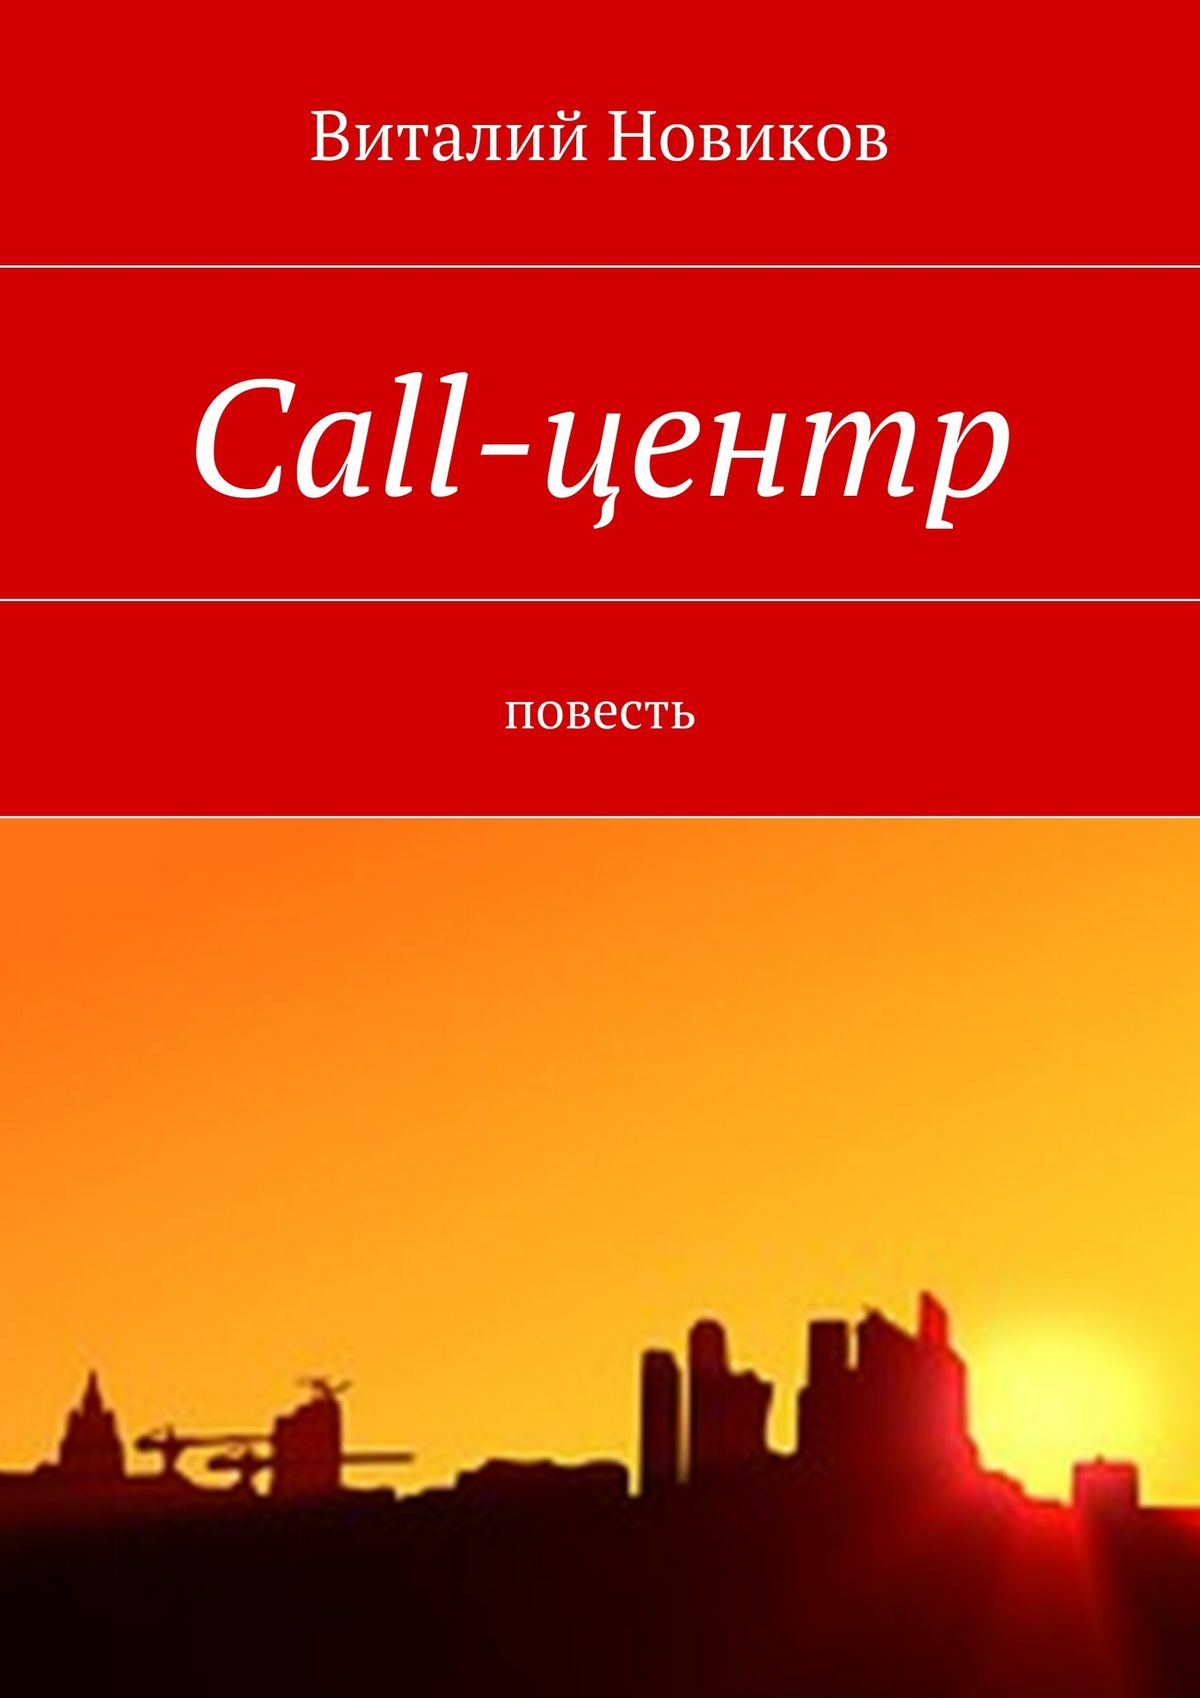 Call-центр. Повесть